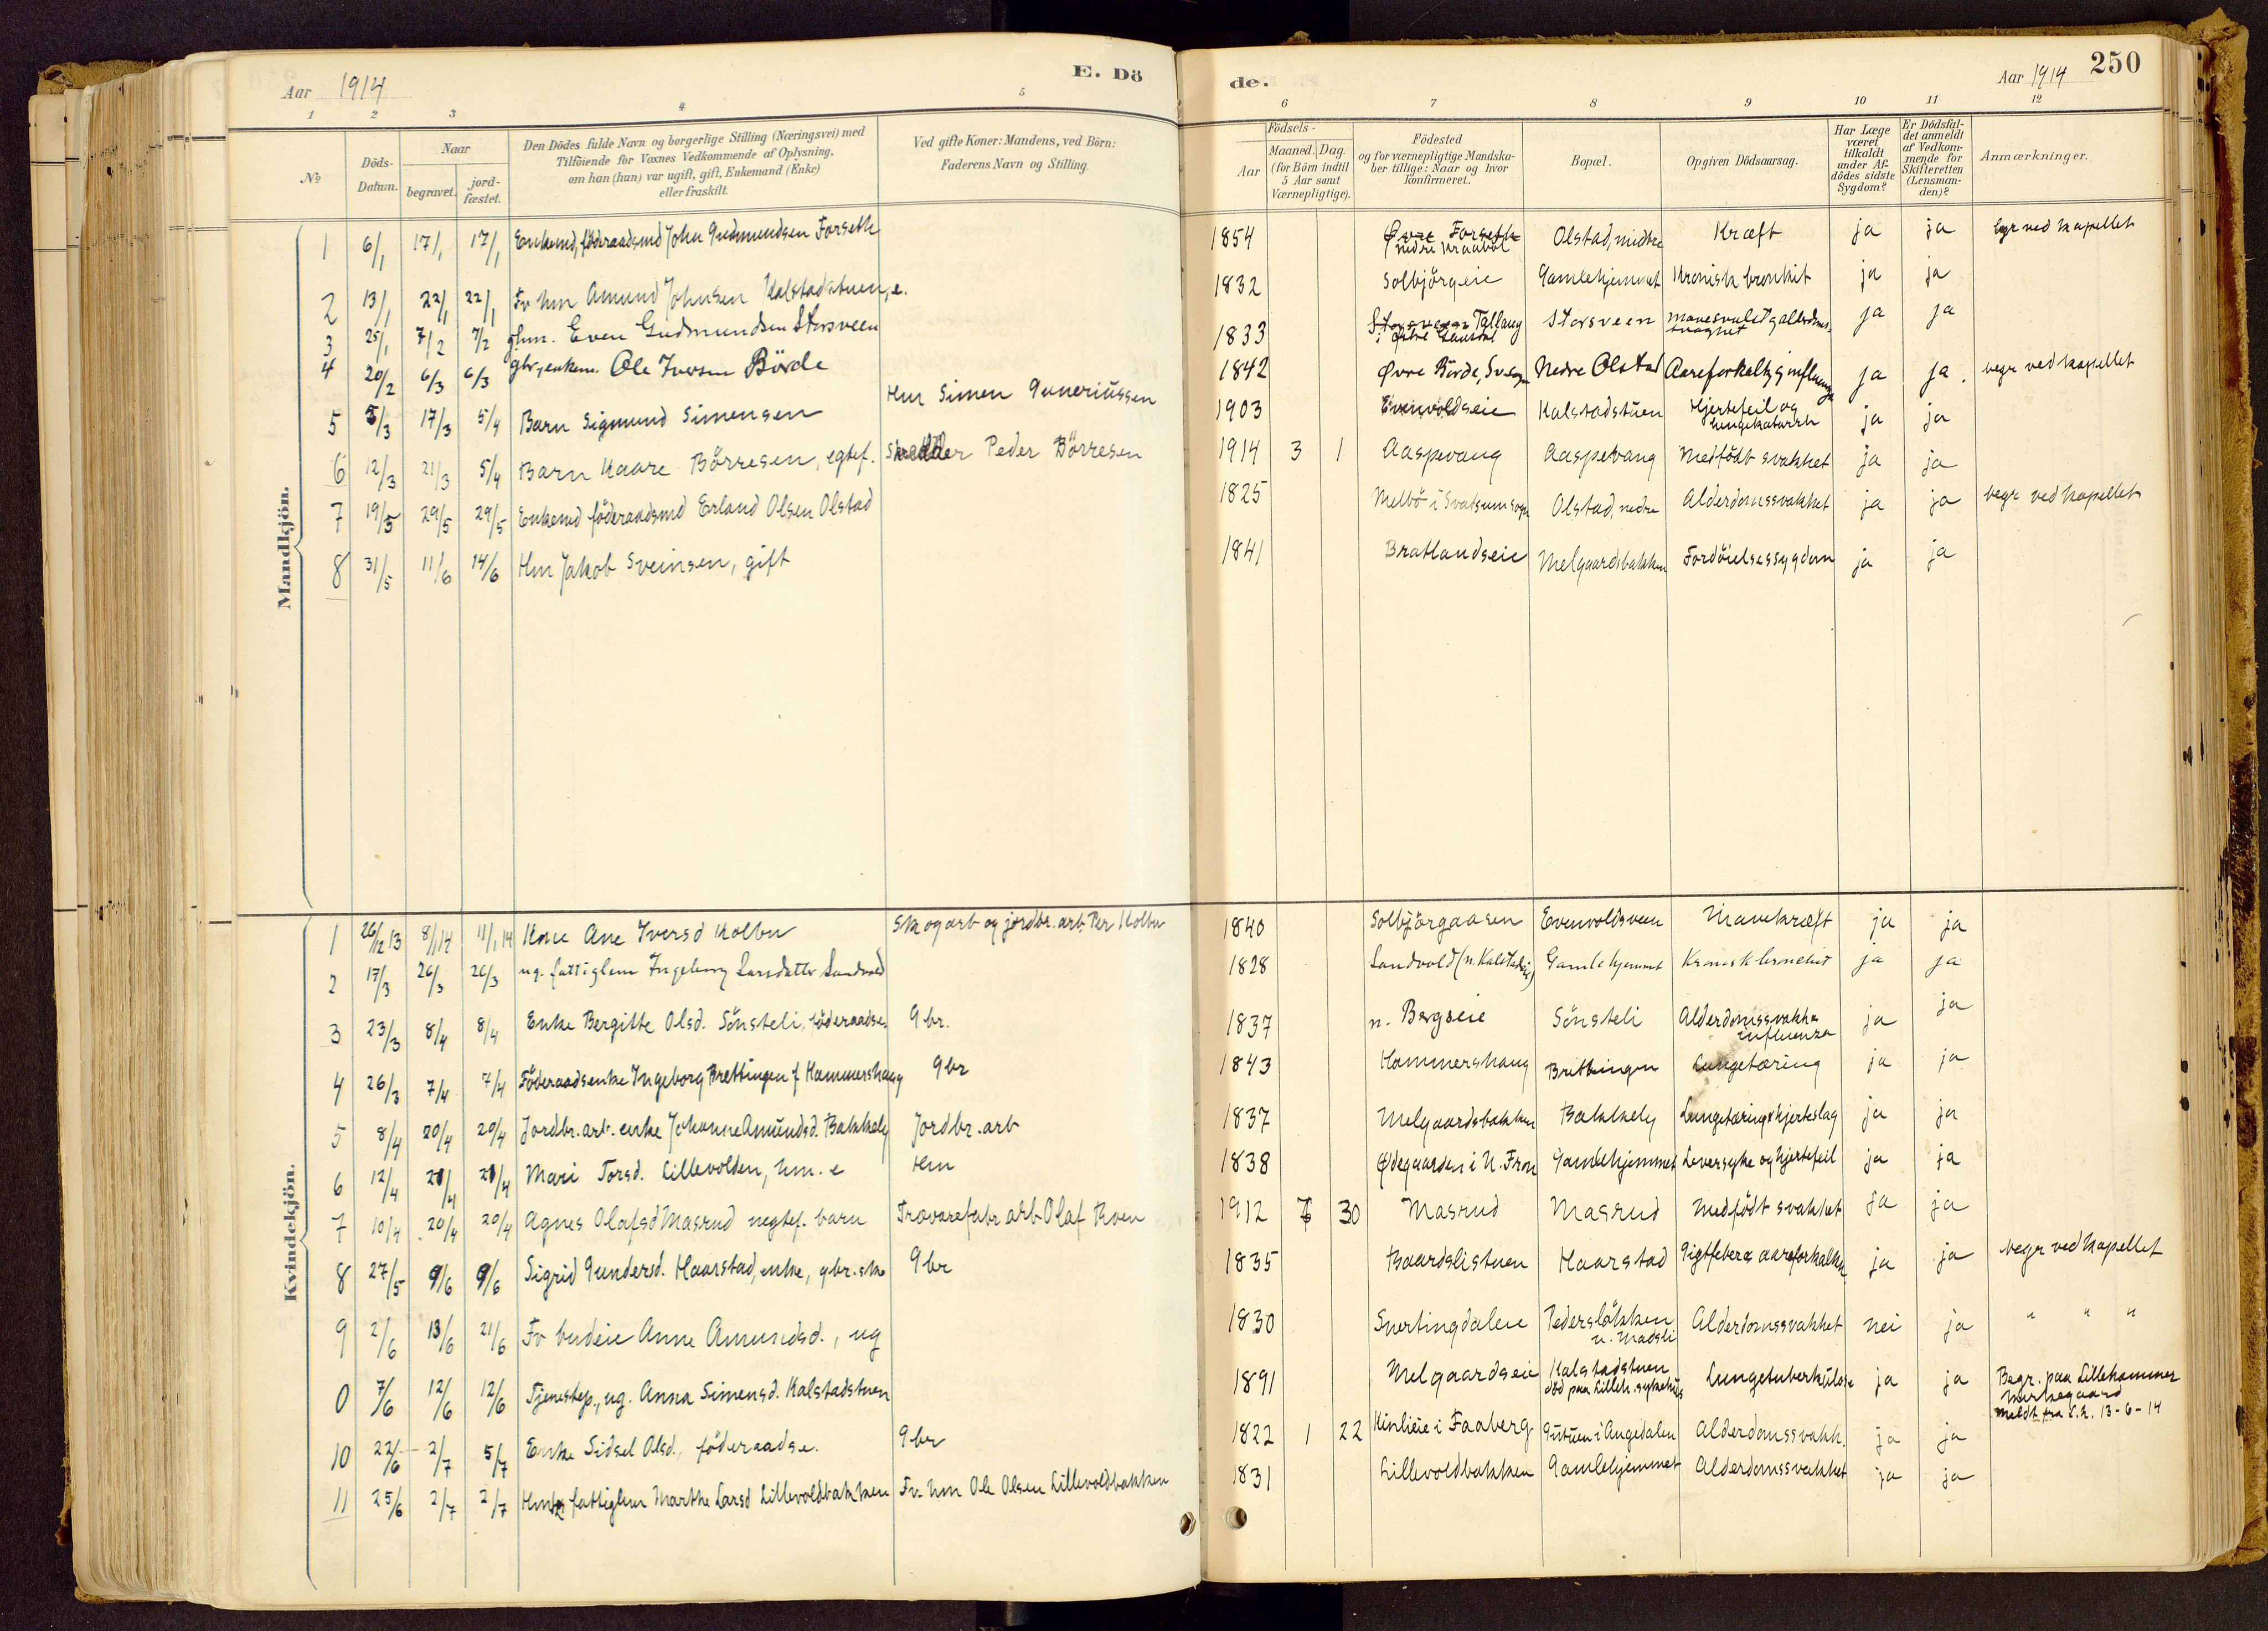 SAH, Vestre Gausdal prestekontor, Ministerialbok nr. 1, 1887-1914, s. 250